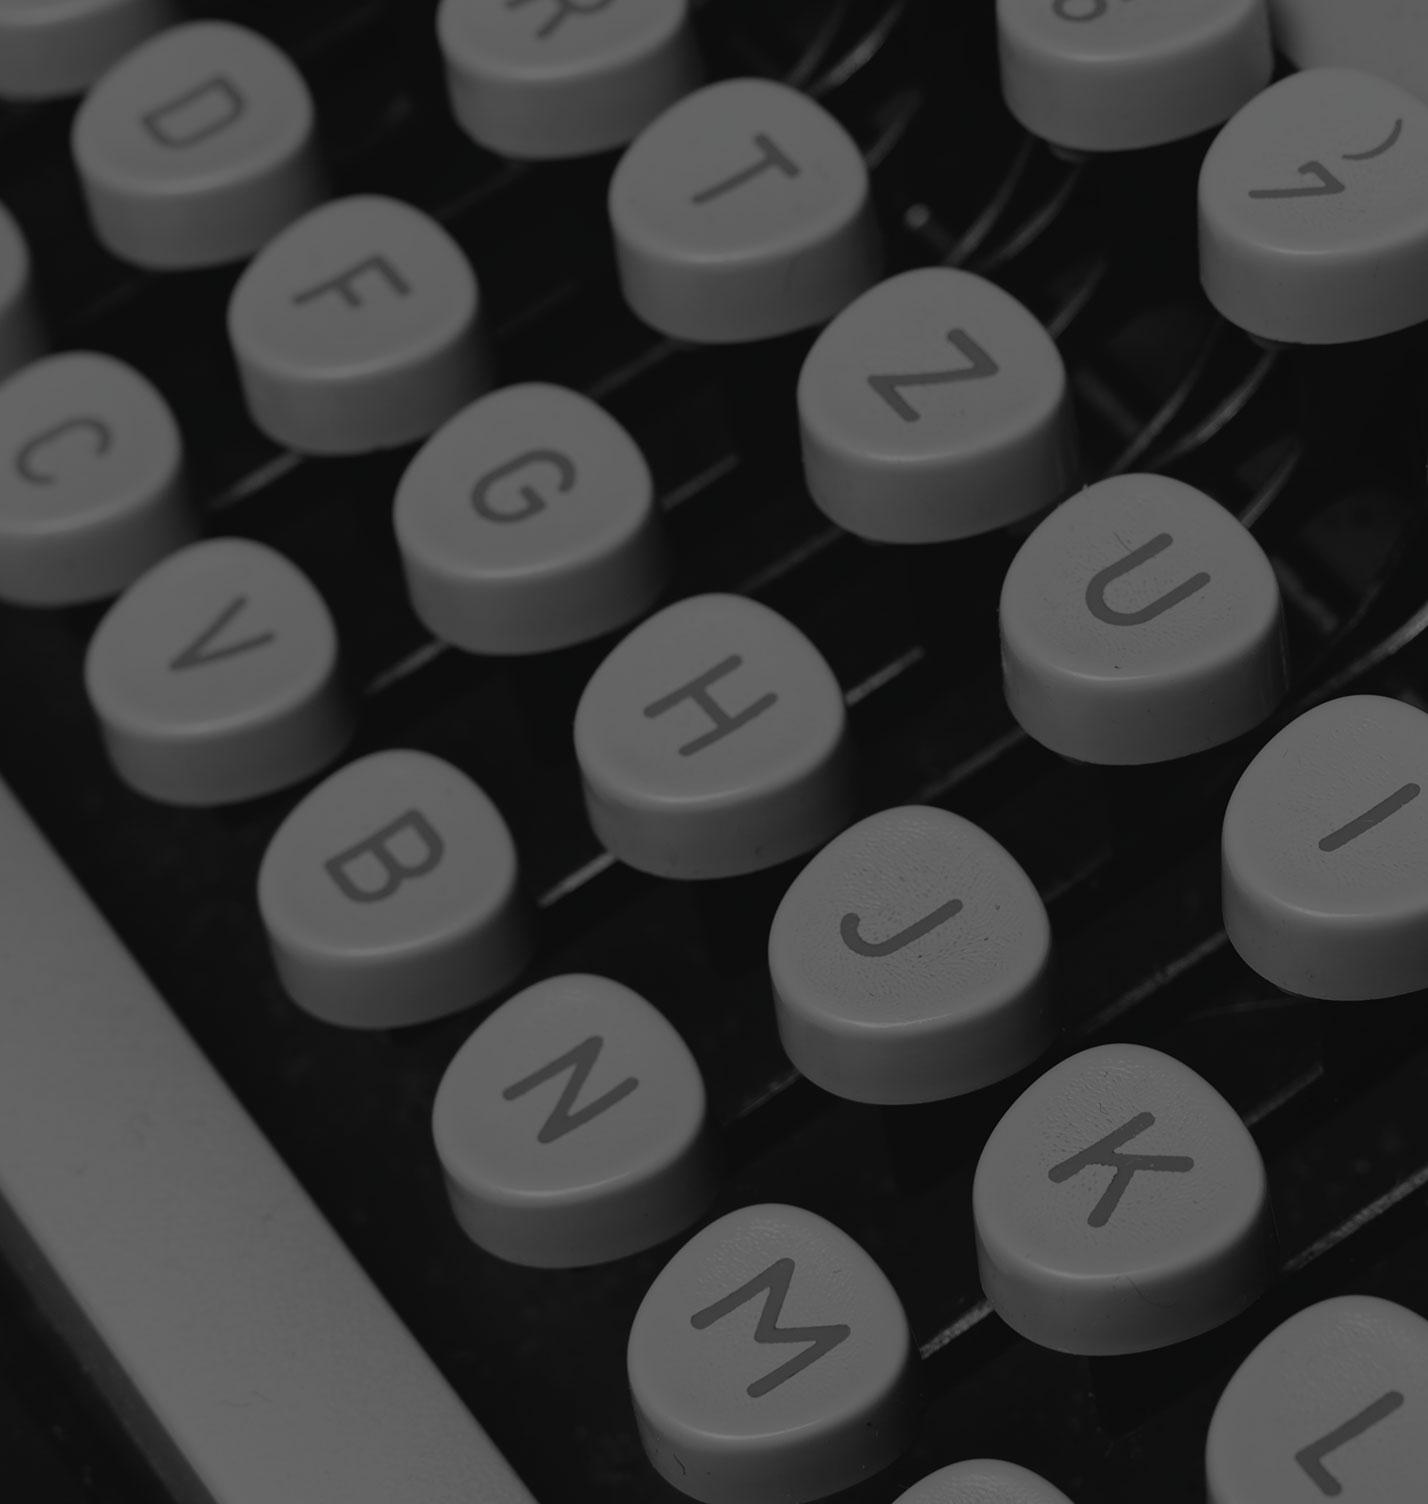 Black and white image of keys on a typewriter.